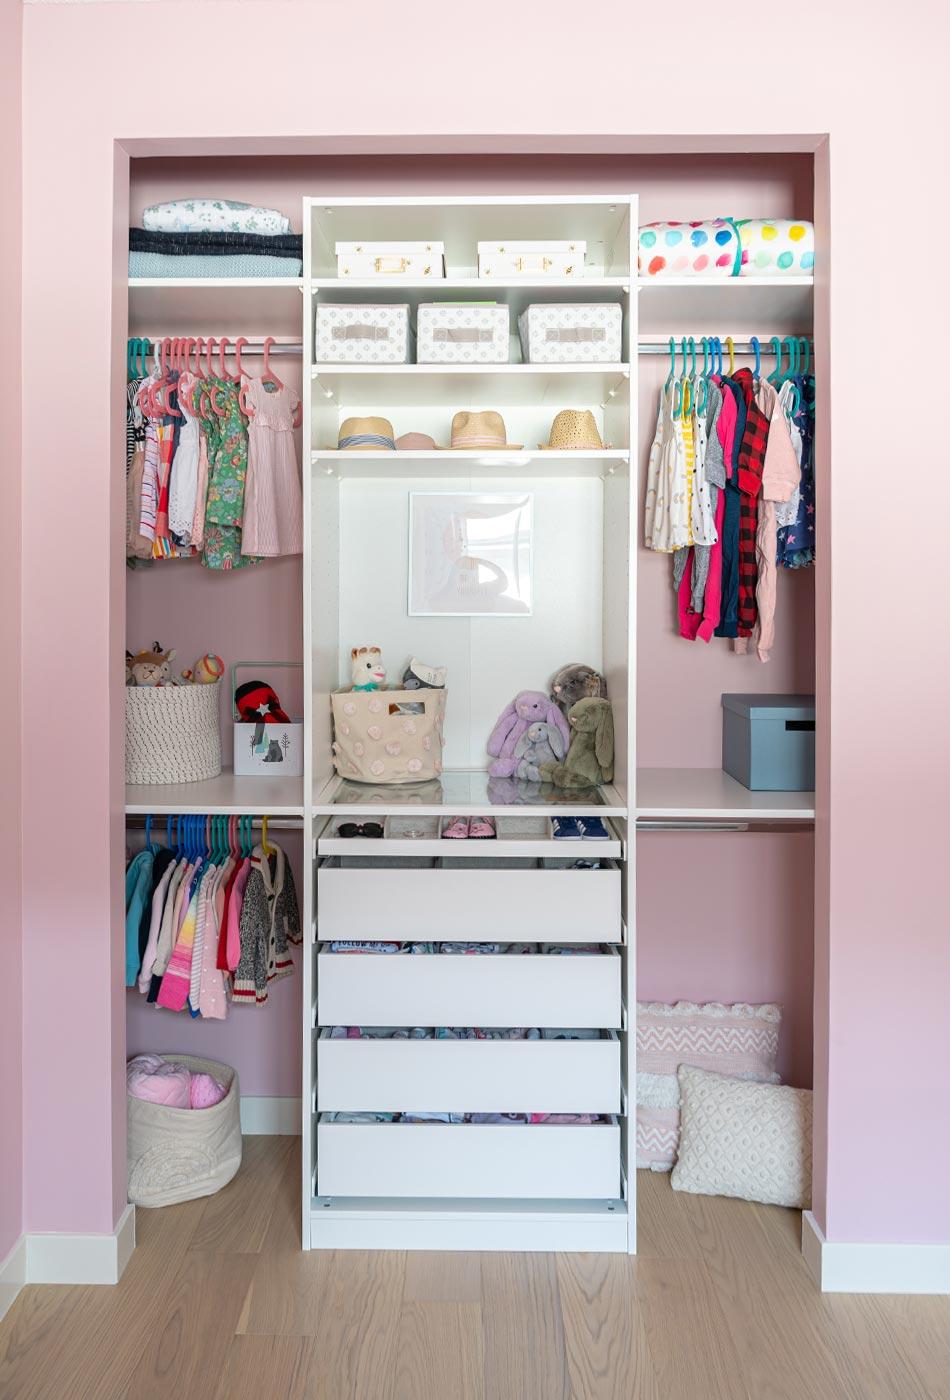 pink nursery, feminine nursery, baby girl room, baby girl nursery, white crib, white crib pink walls, pink walls nursery, modern feminine nursery, modern girls room, modern baby girl room, pompom curtains nursery, IKEA PAX Wardrobe hack, IKEA PAX Wardrobe nursery closet,